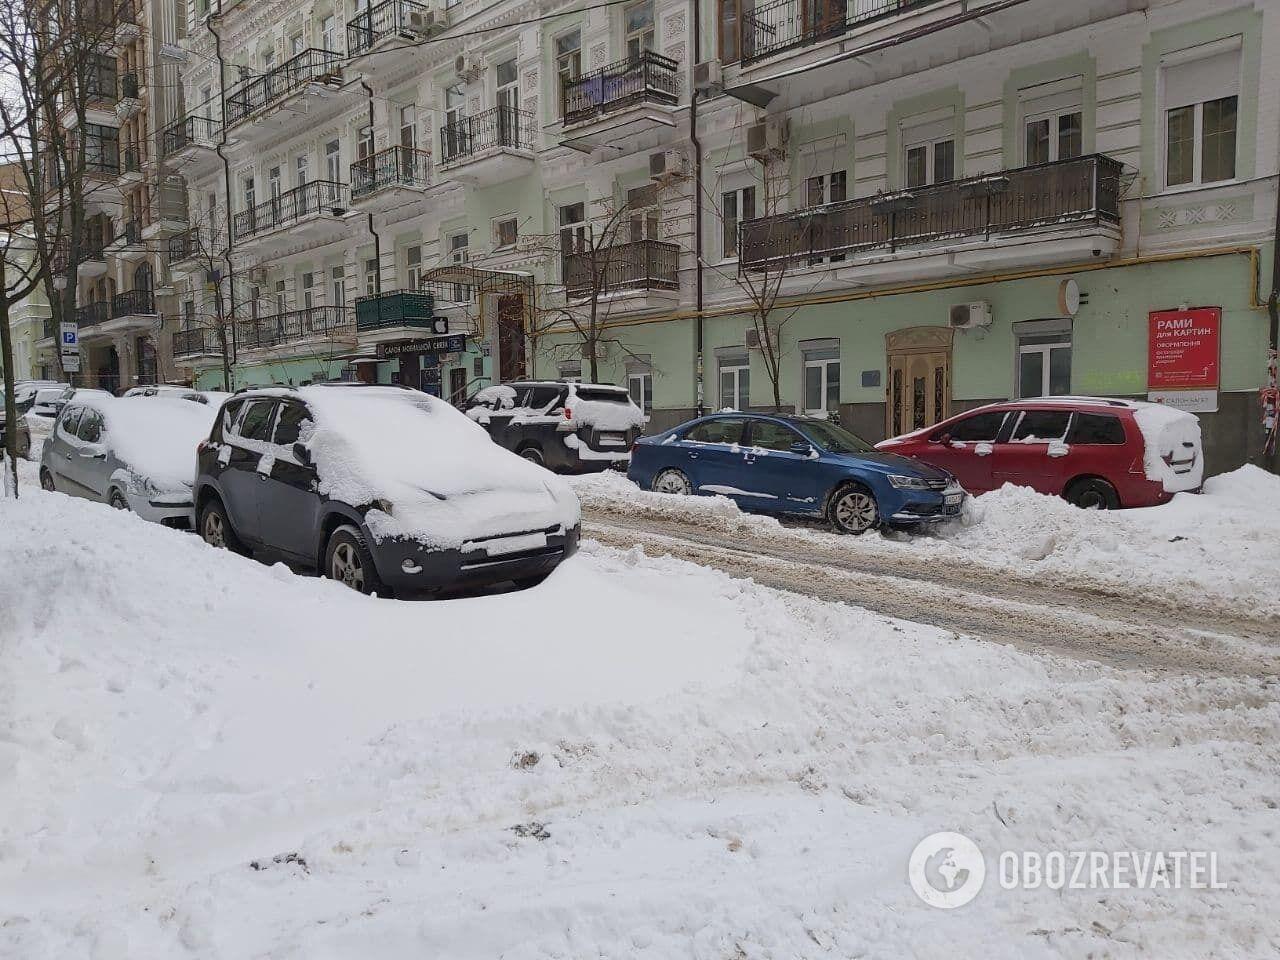 Много снега скопилось на краю проезжей части.